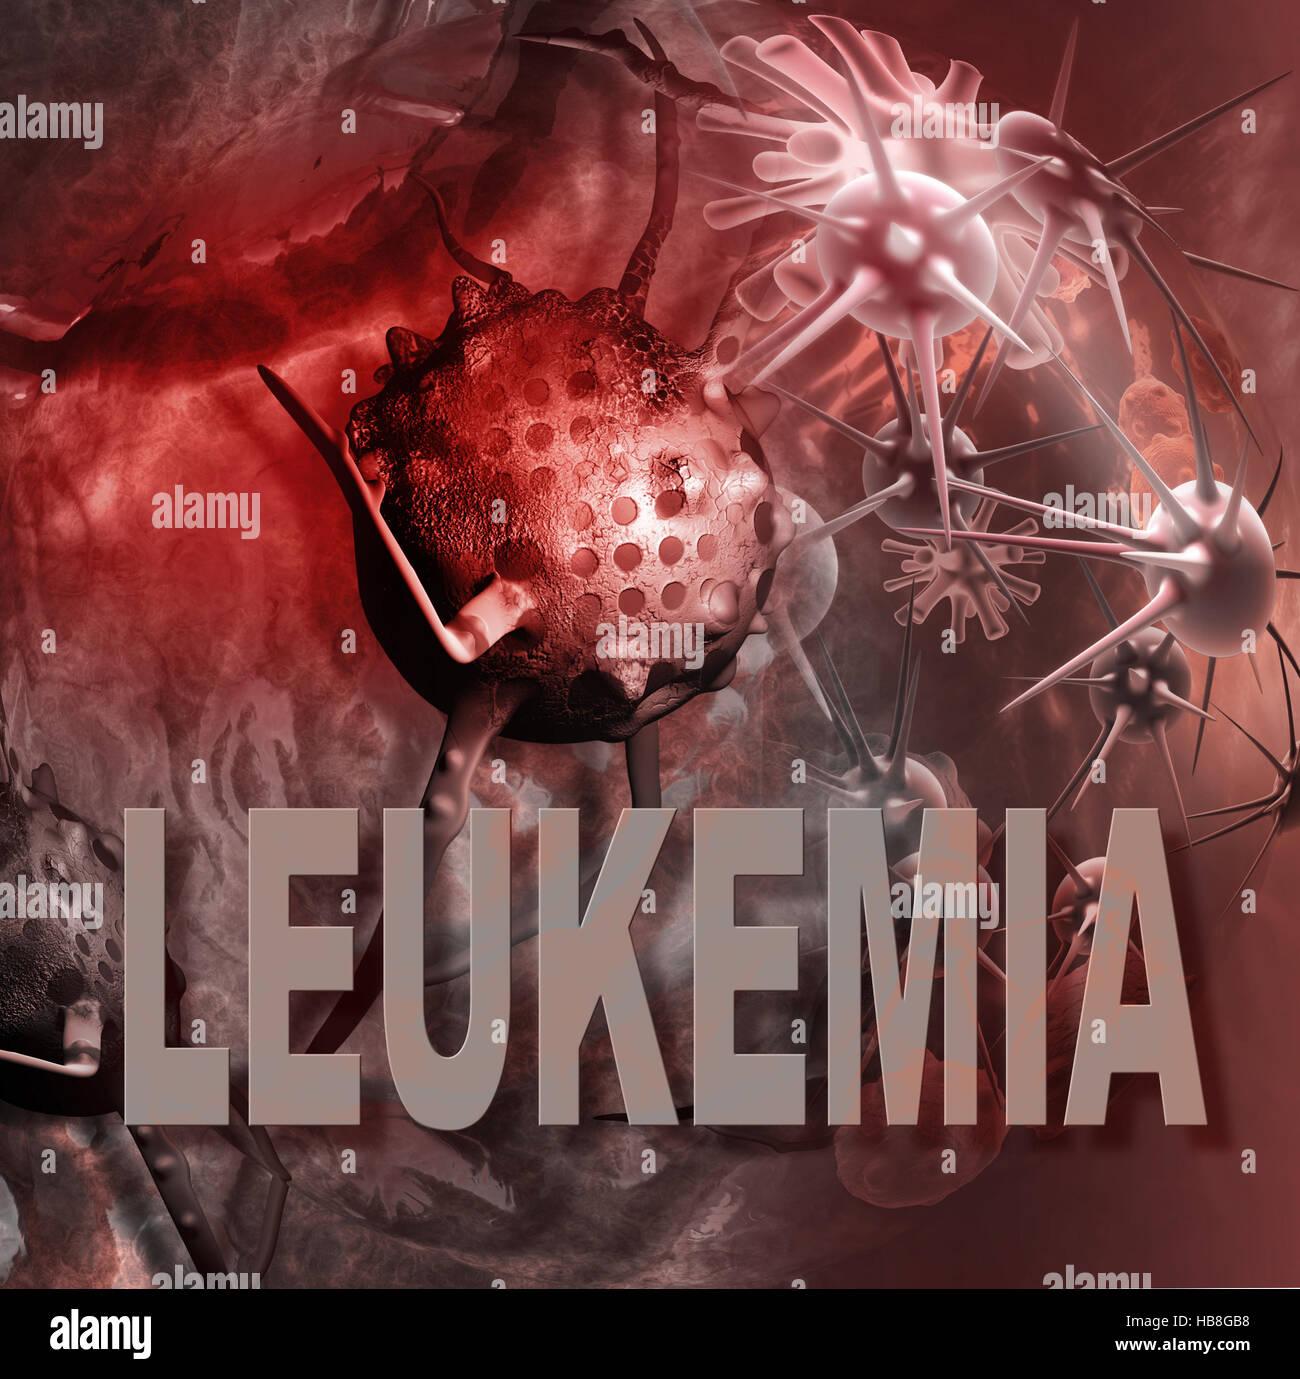 leukemia cells - Stock Image